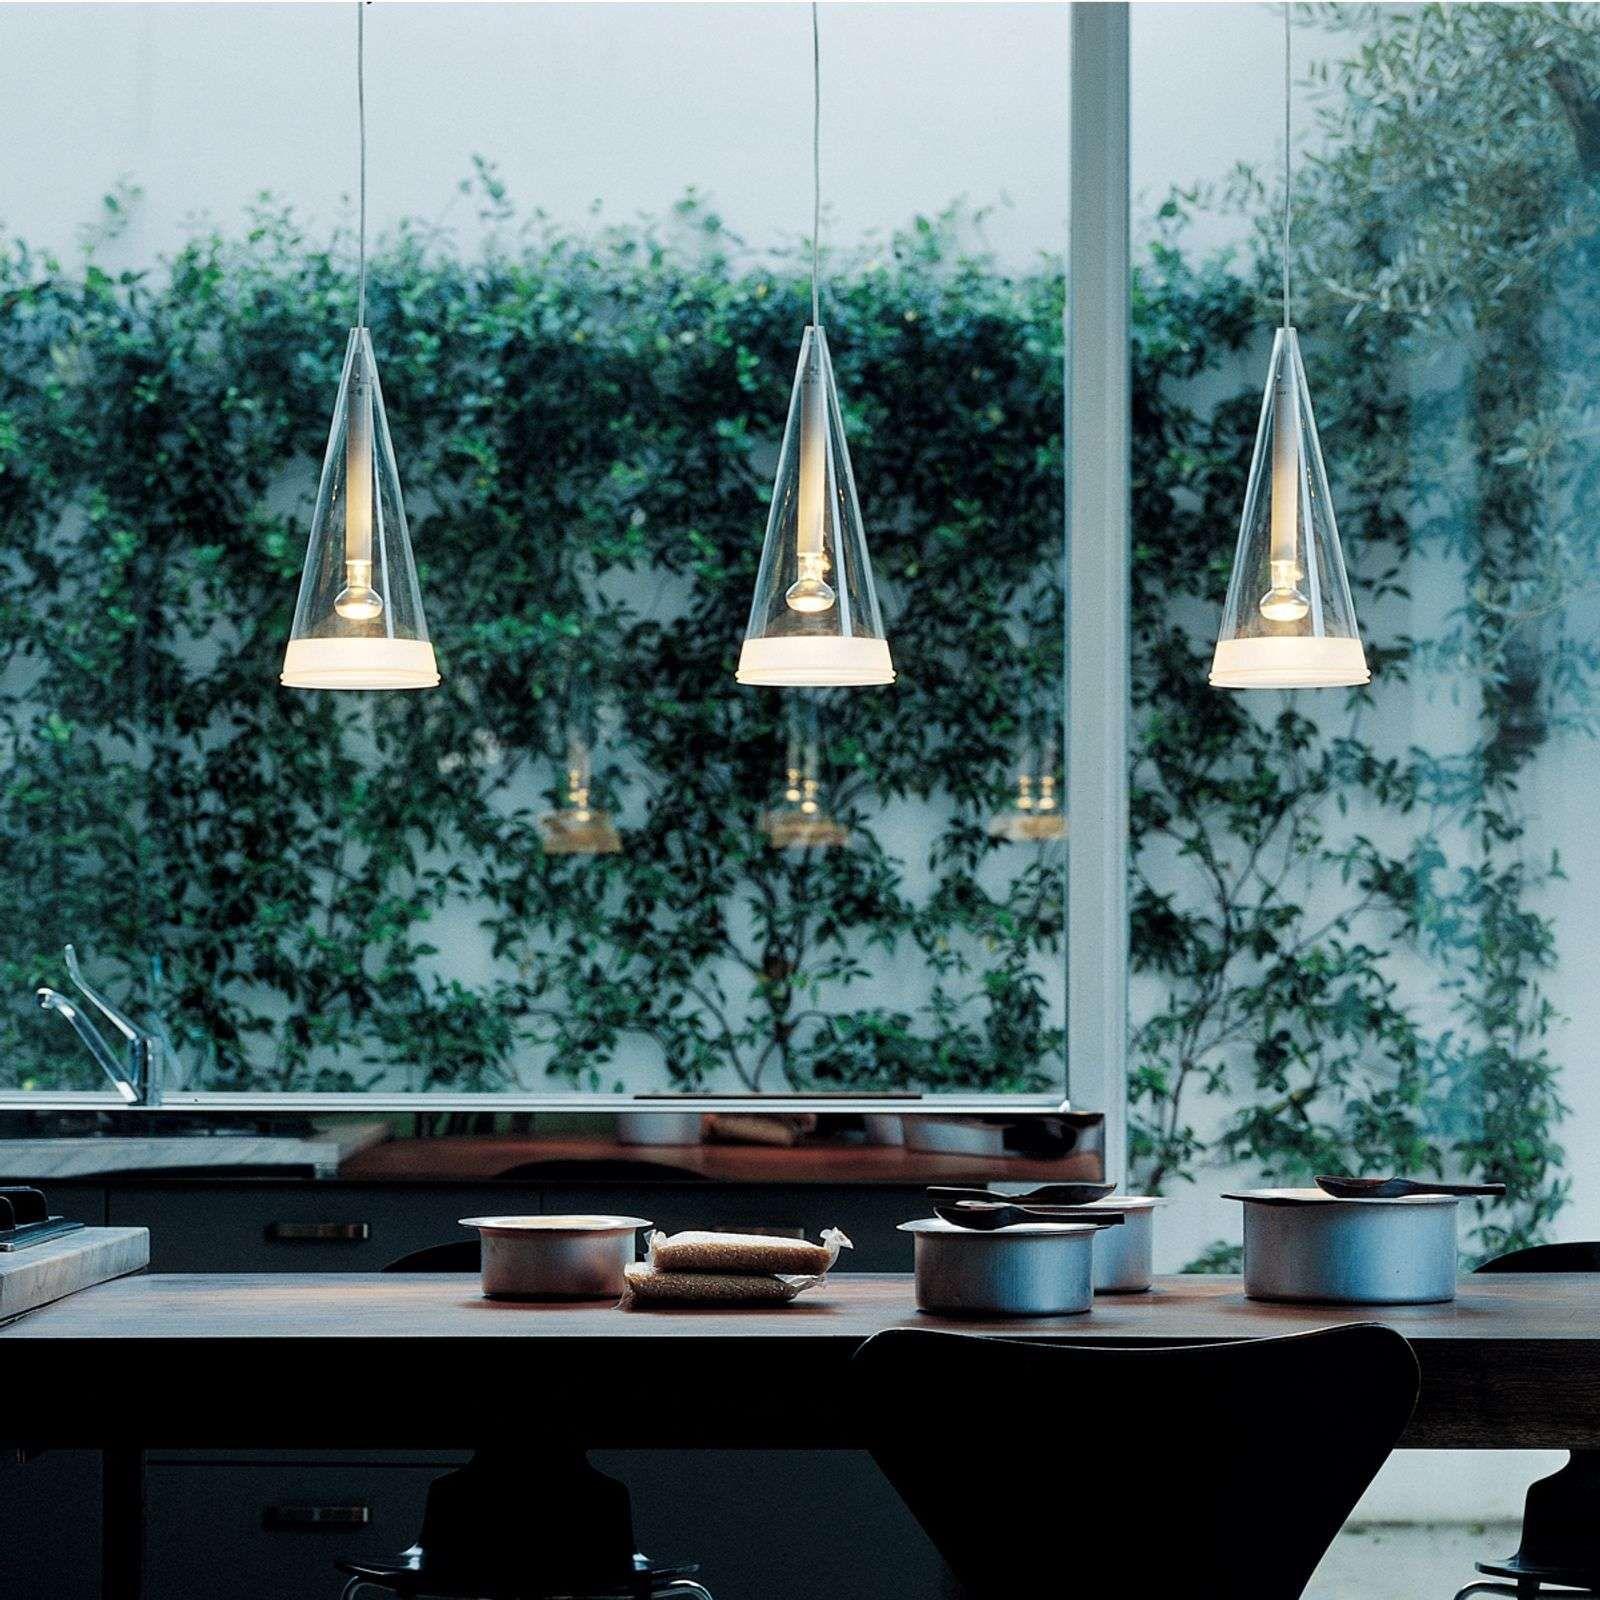 Flos Fucsia Hanglamp Van Glas Met 1 Lampje Hanglamp Moderne Verlichting Glas